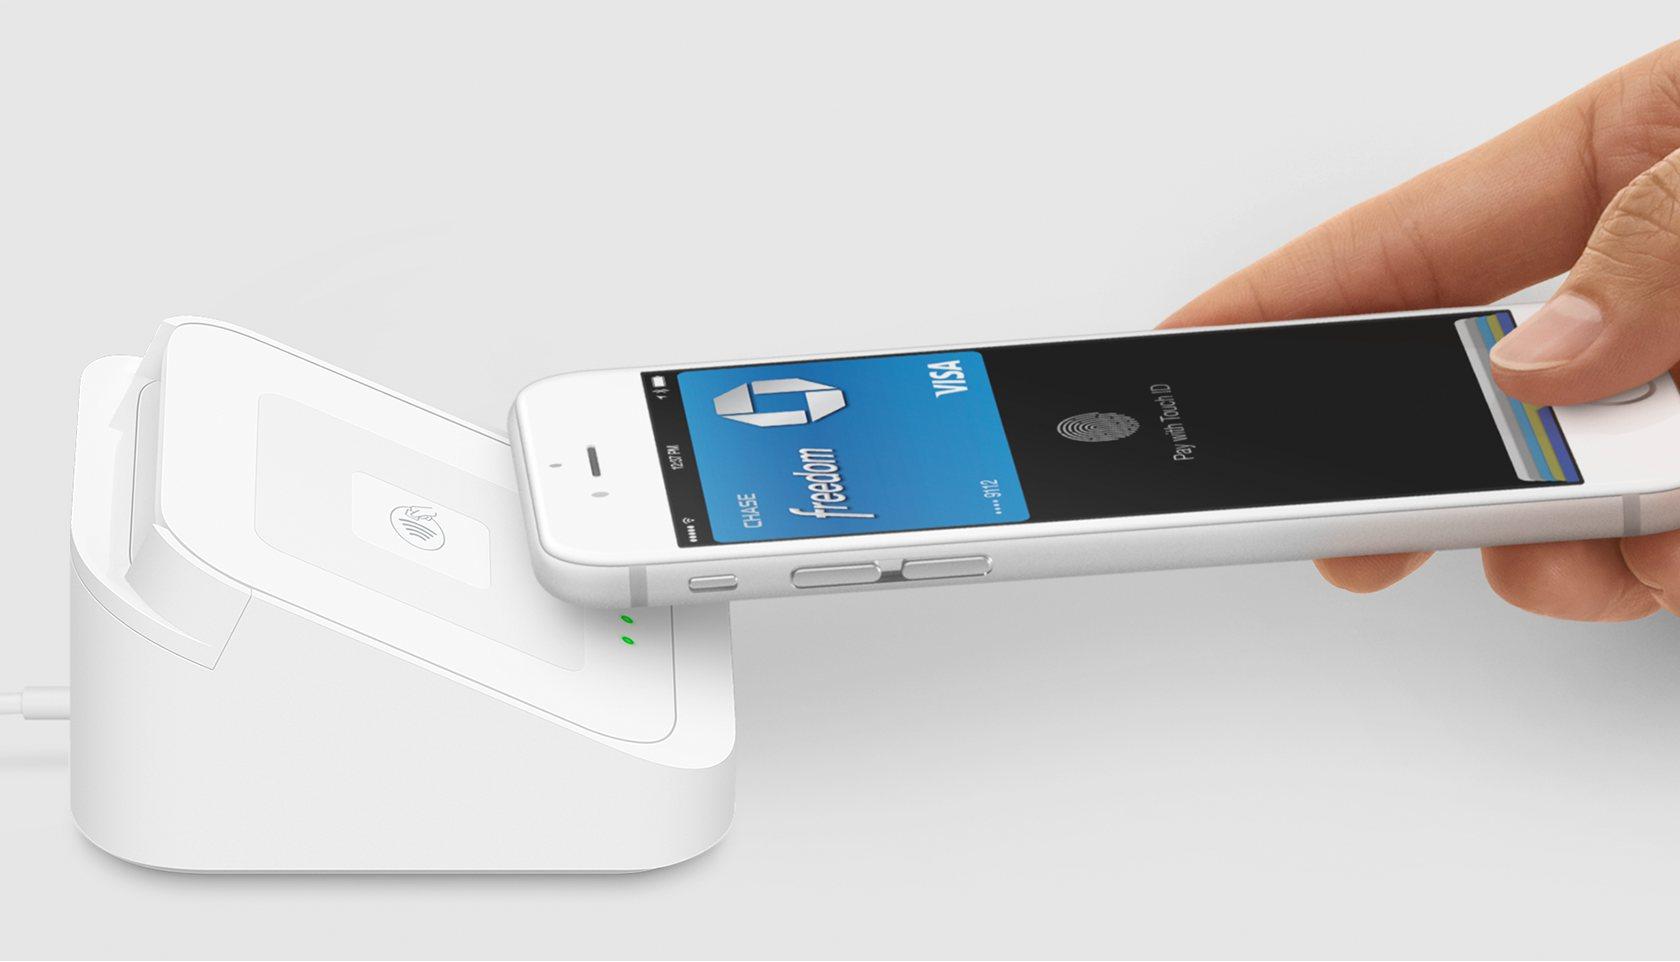 NFC Application